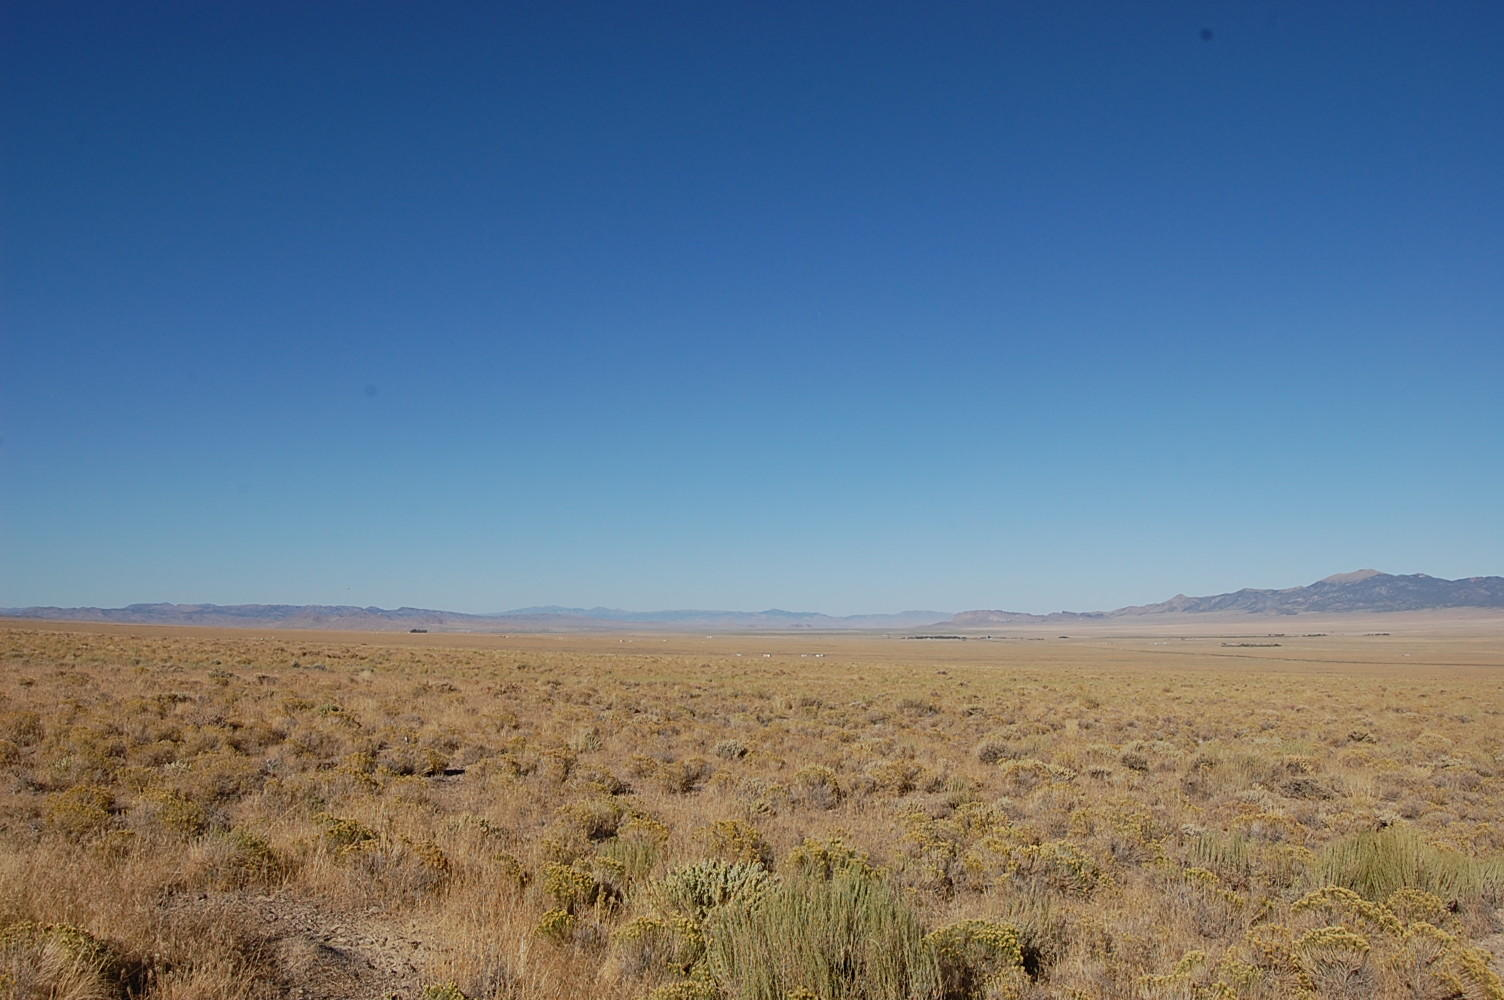 Escape into the Nevada Mountain Range on Stunning 2 Acres - Image 5